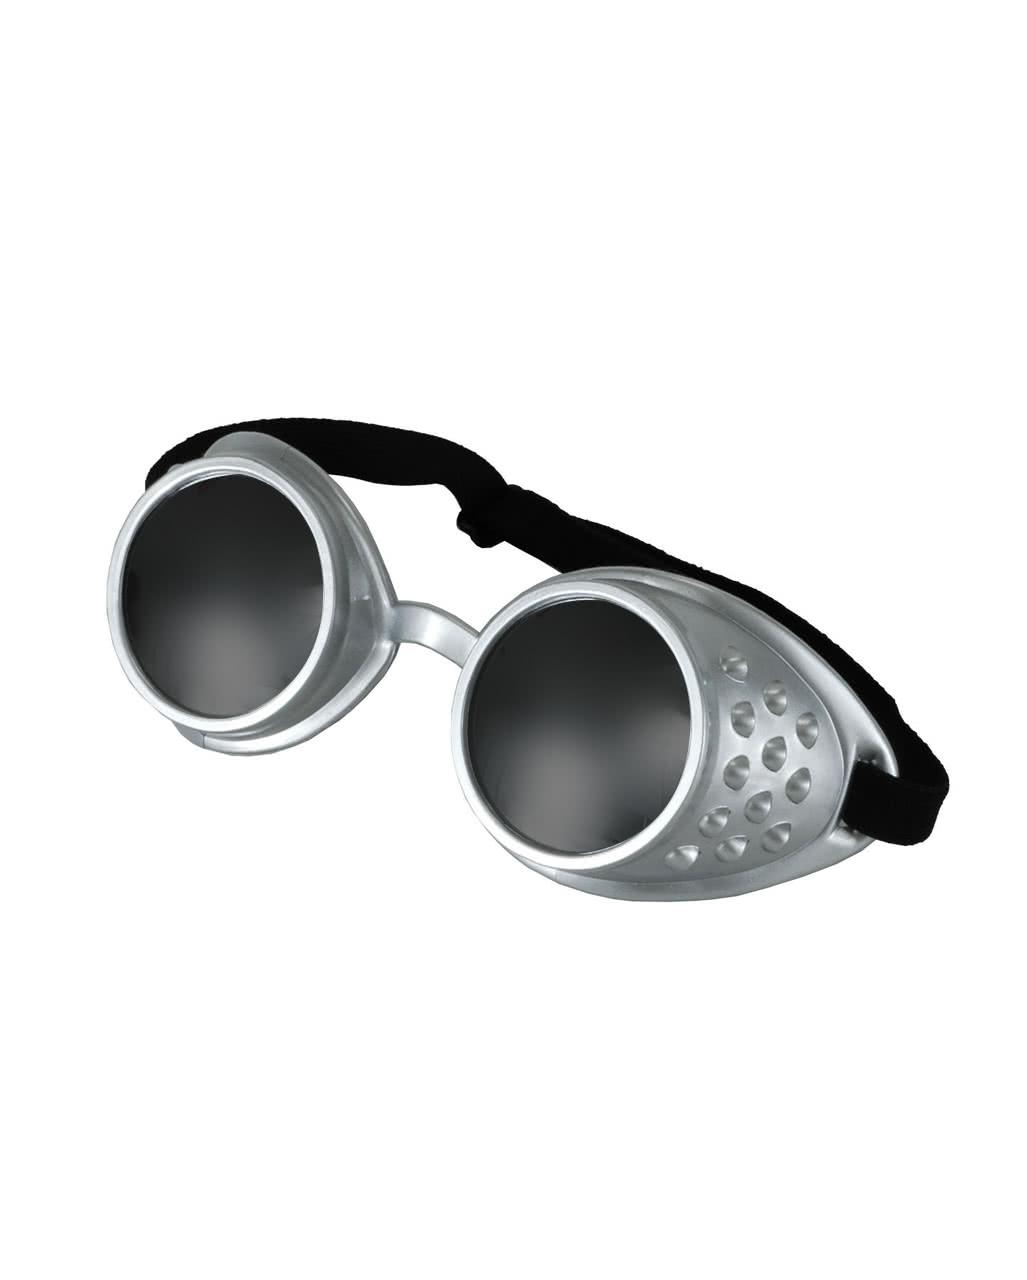 Silber-grüne Steampunk Brille Aviator als Kostümzubehör 6vcb66ayBu